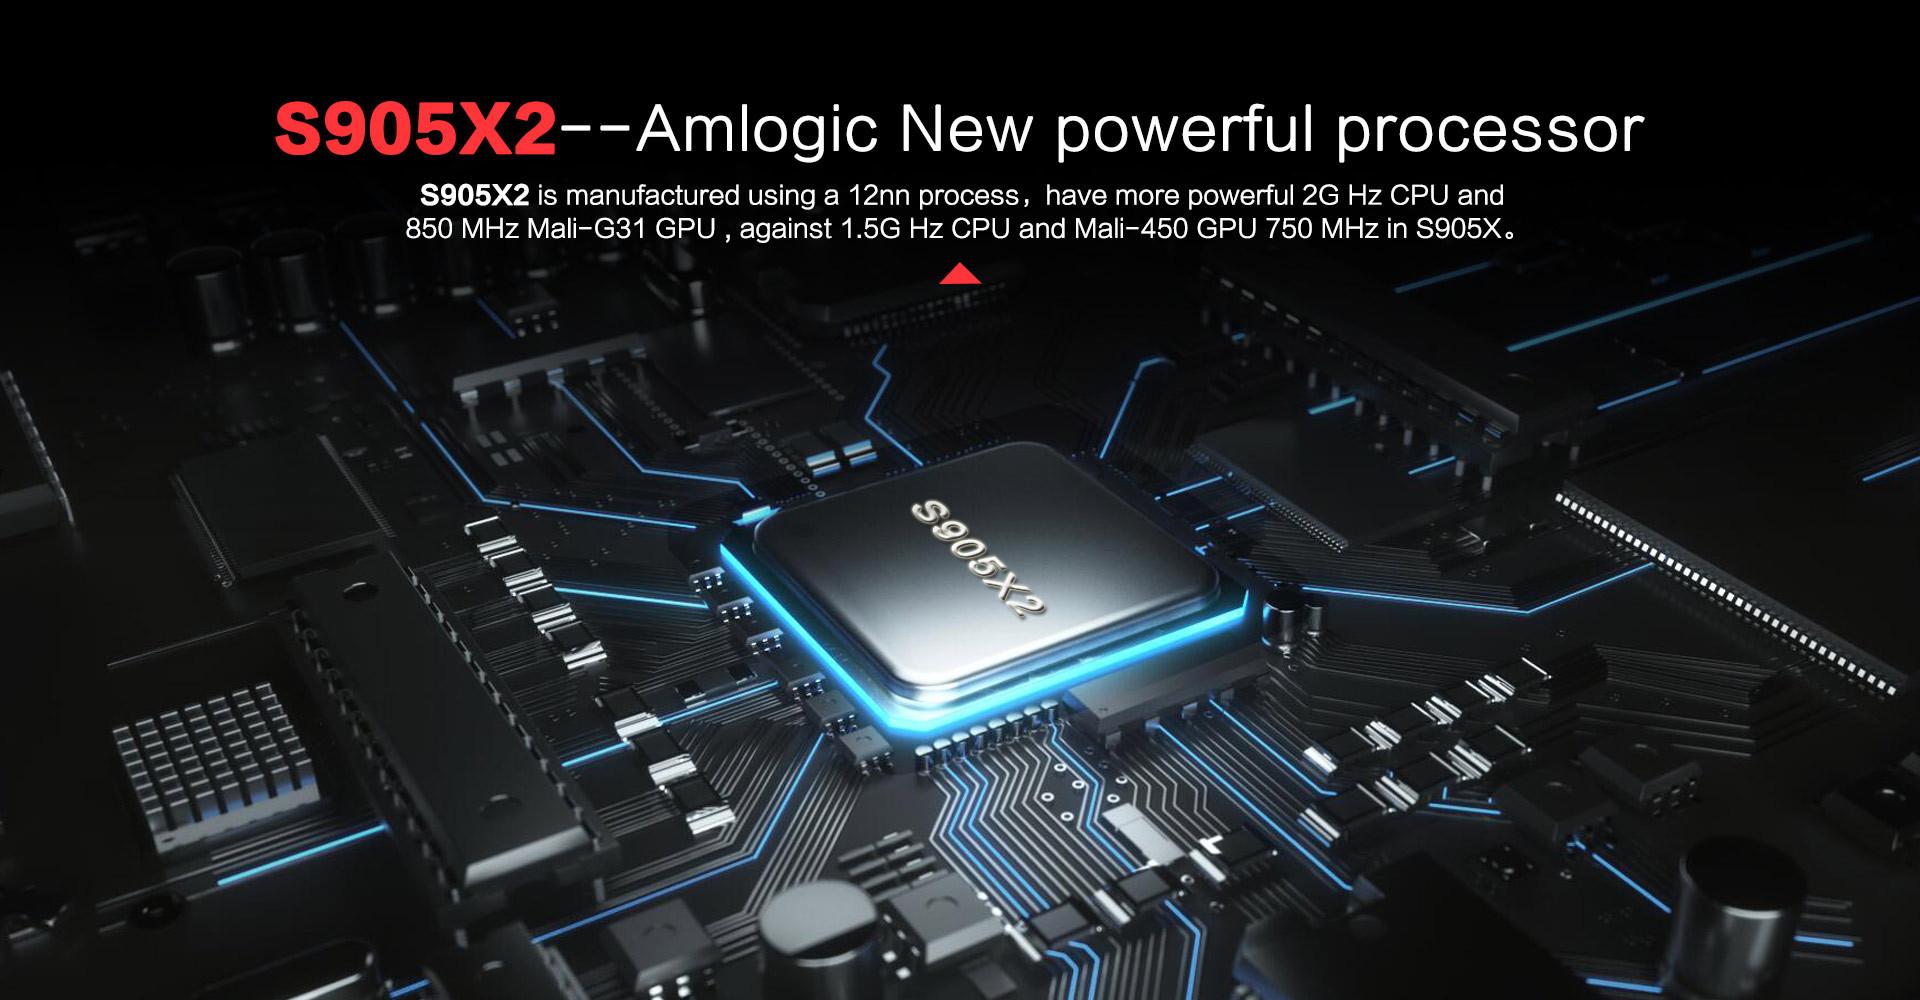 https://thegioiandroidtv.com/wp-content/uploads/2019/07/thi%E1%BA%BFt-k%E1%BA%BF-chip.jpg